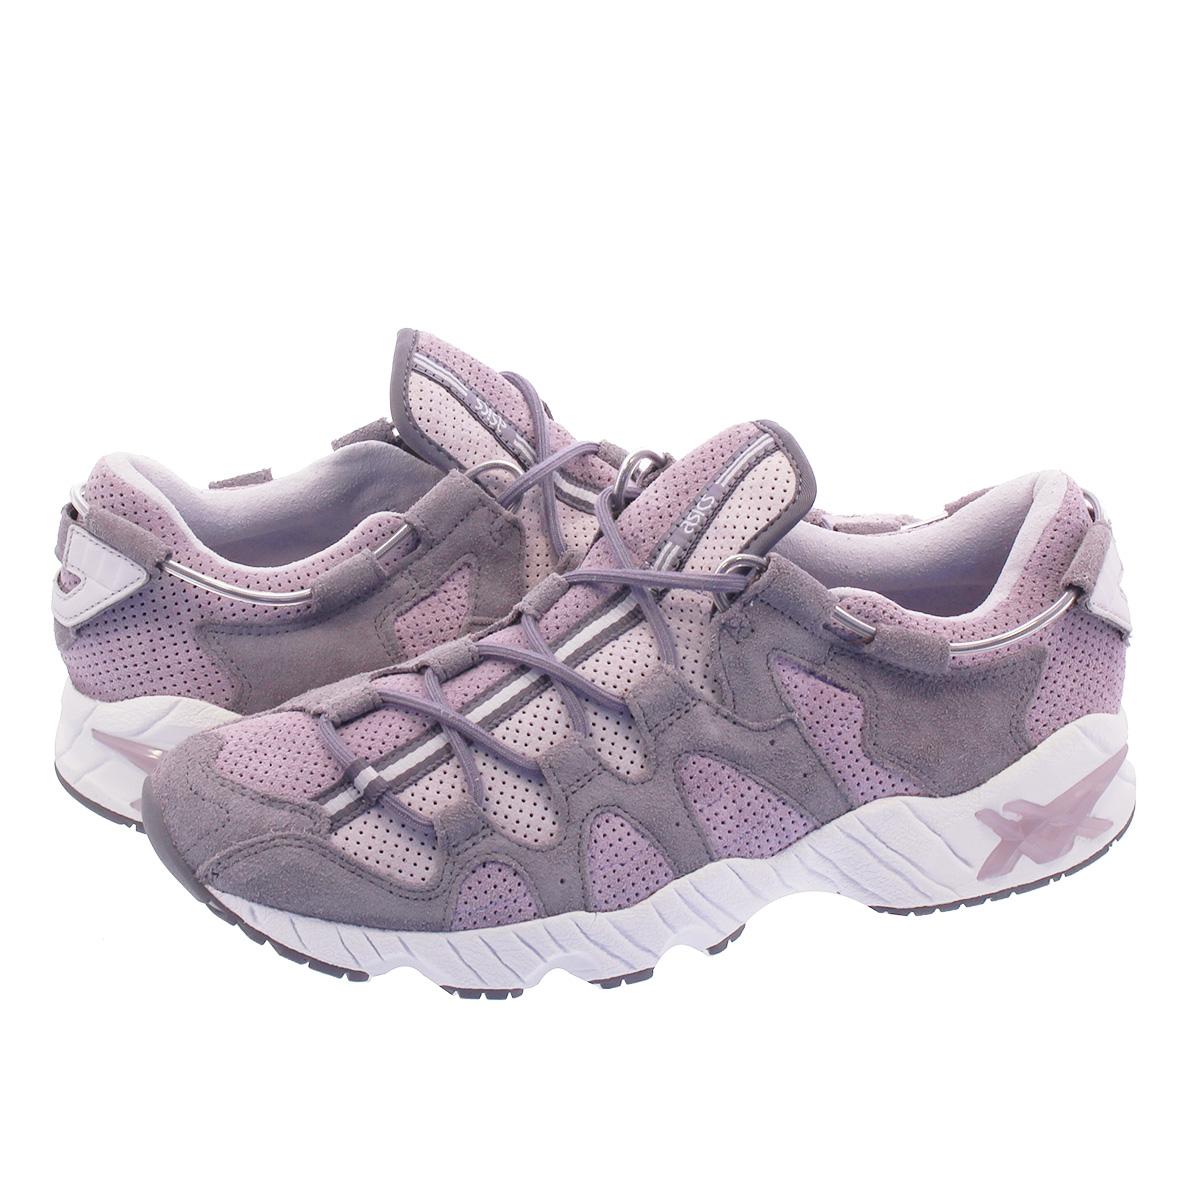 Asics GEL MAI Soft LavenderLavender 1193A043 500